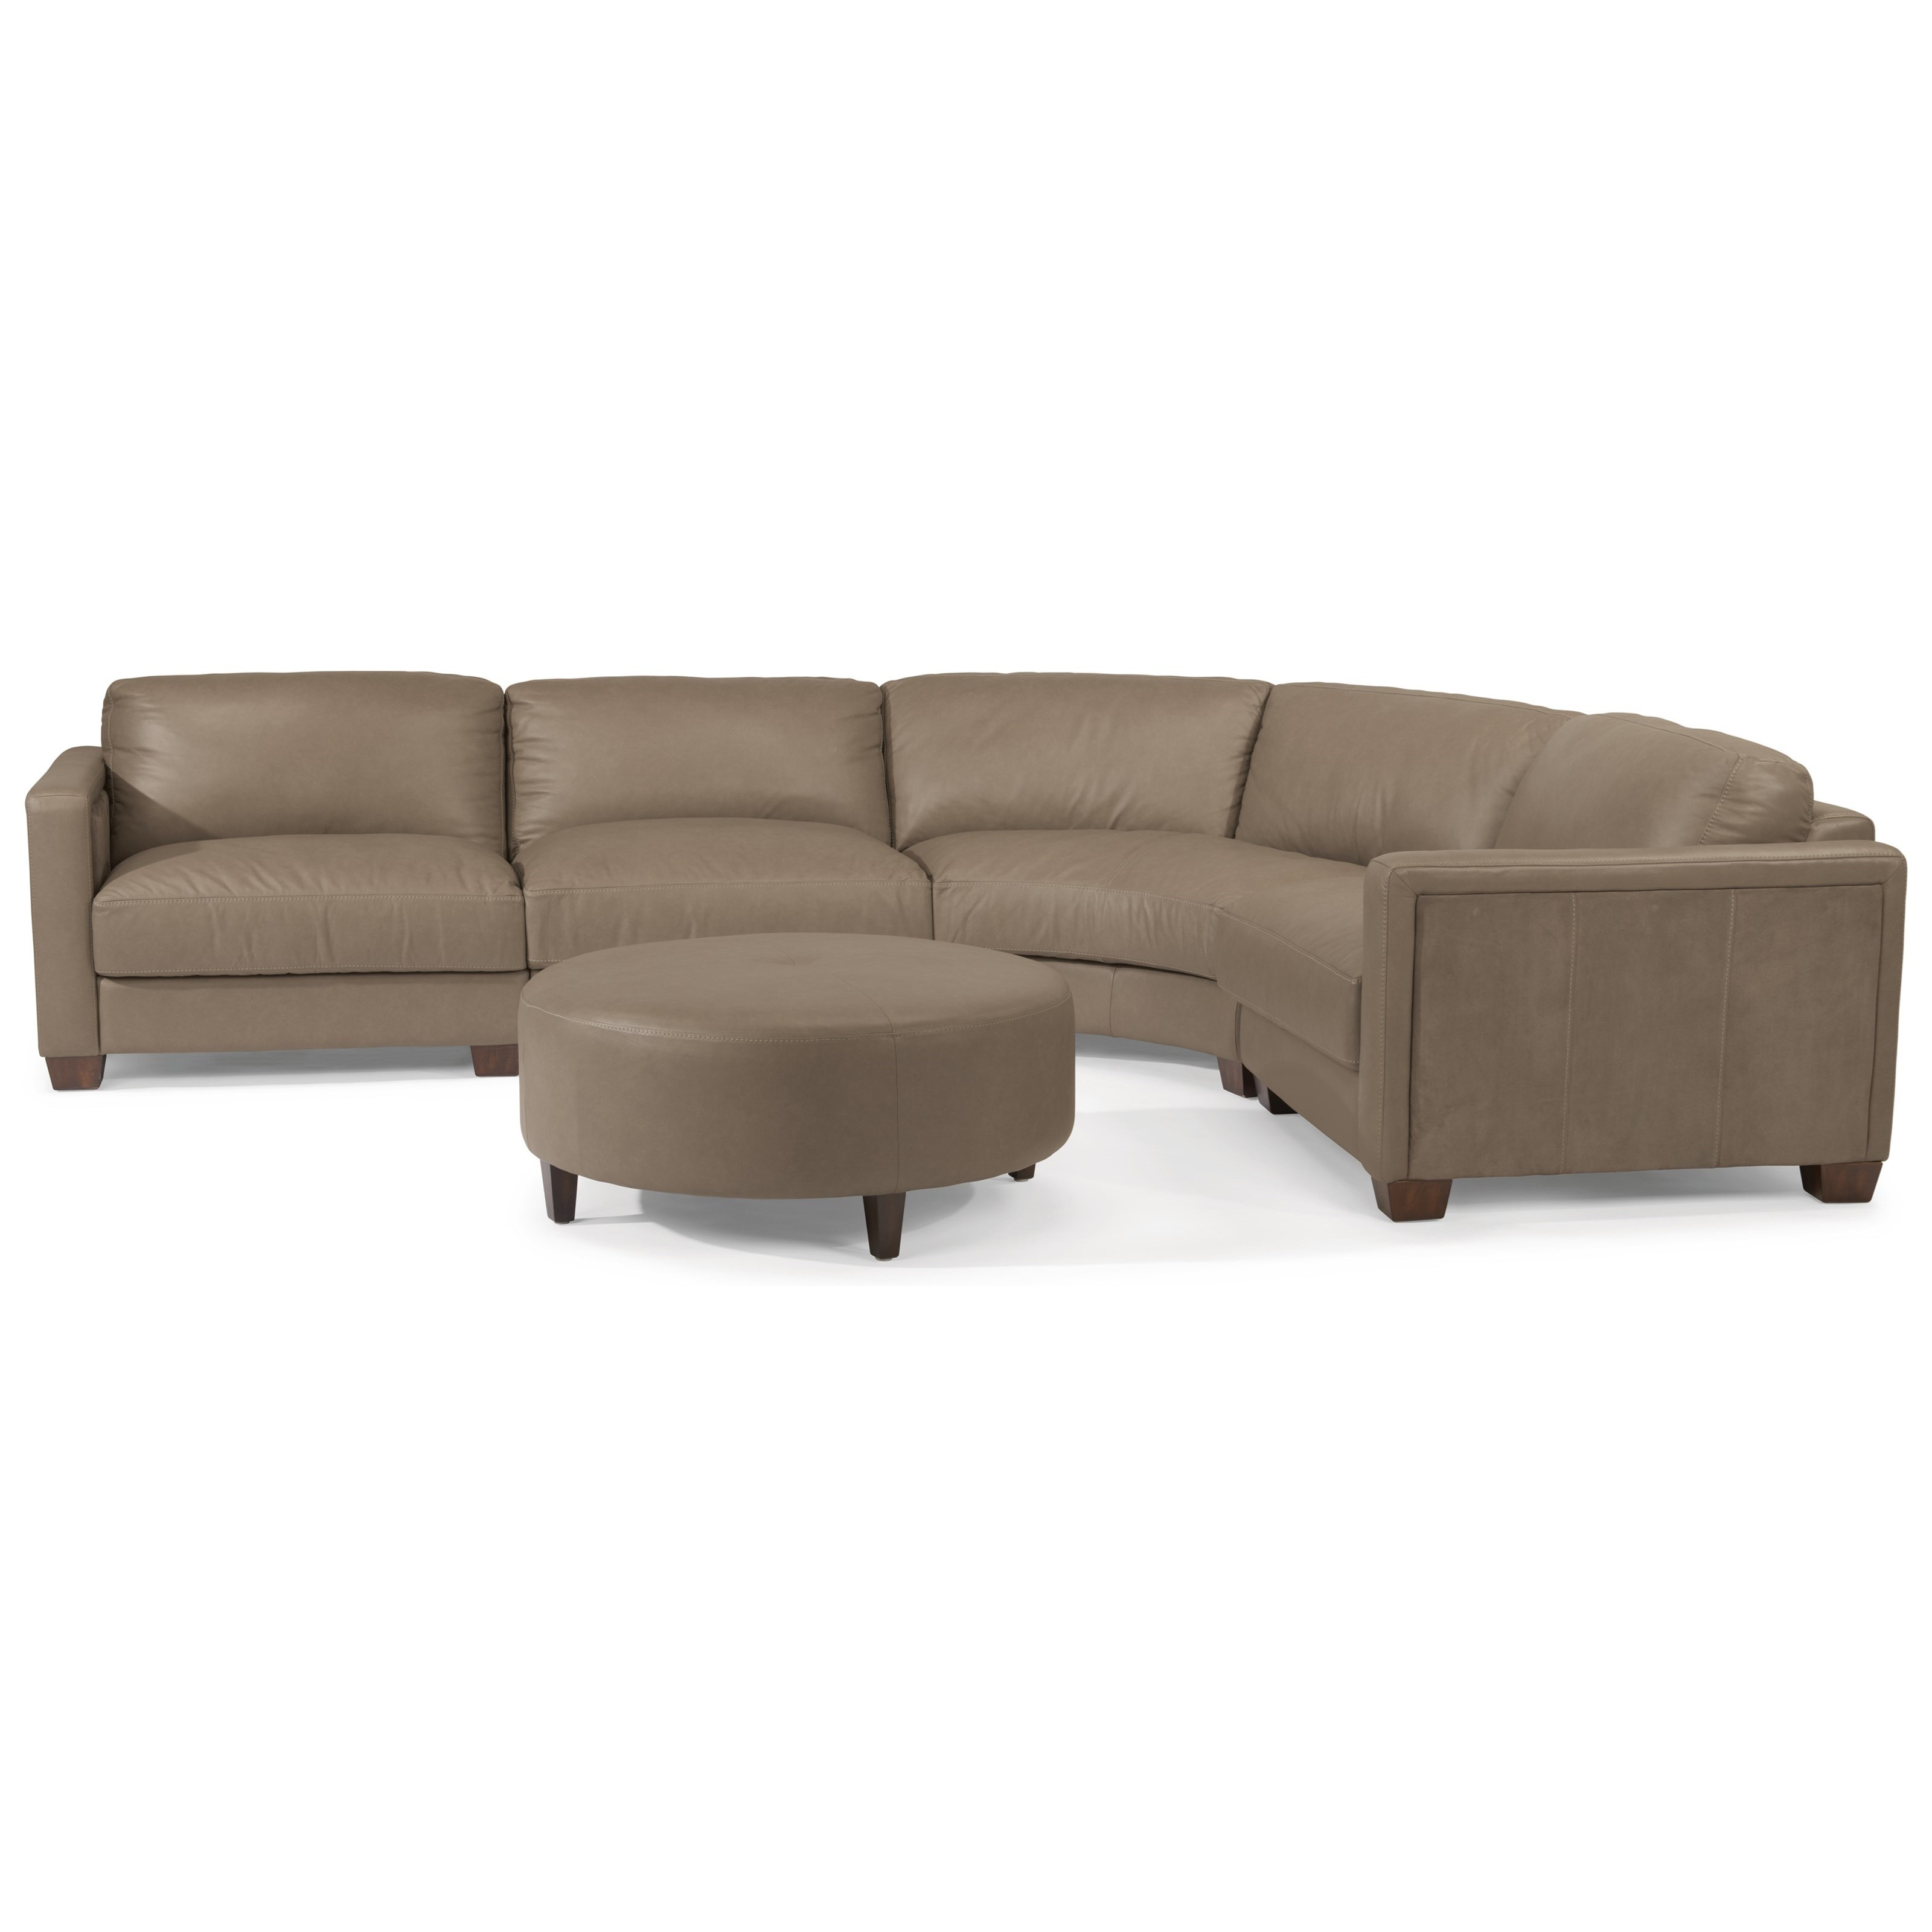 Flexsteel Latitudes Wyman Contemporary 5 Seat Rounded Sectional